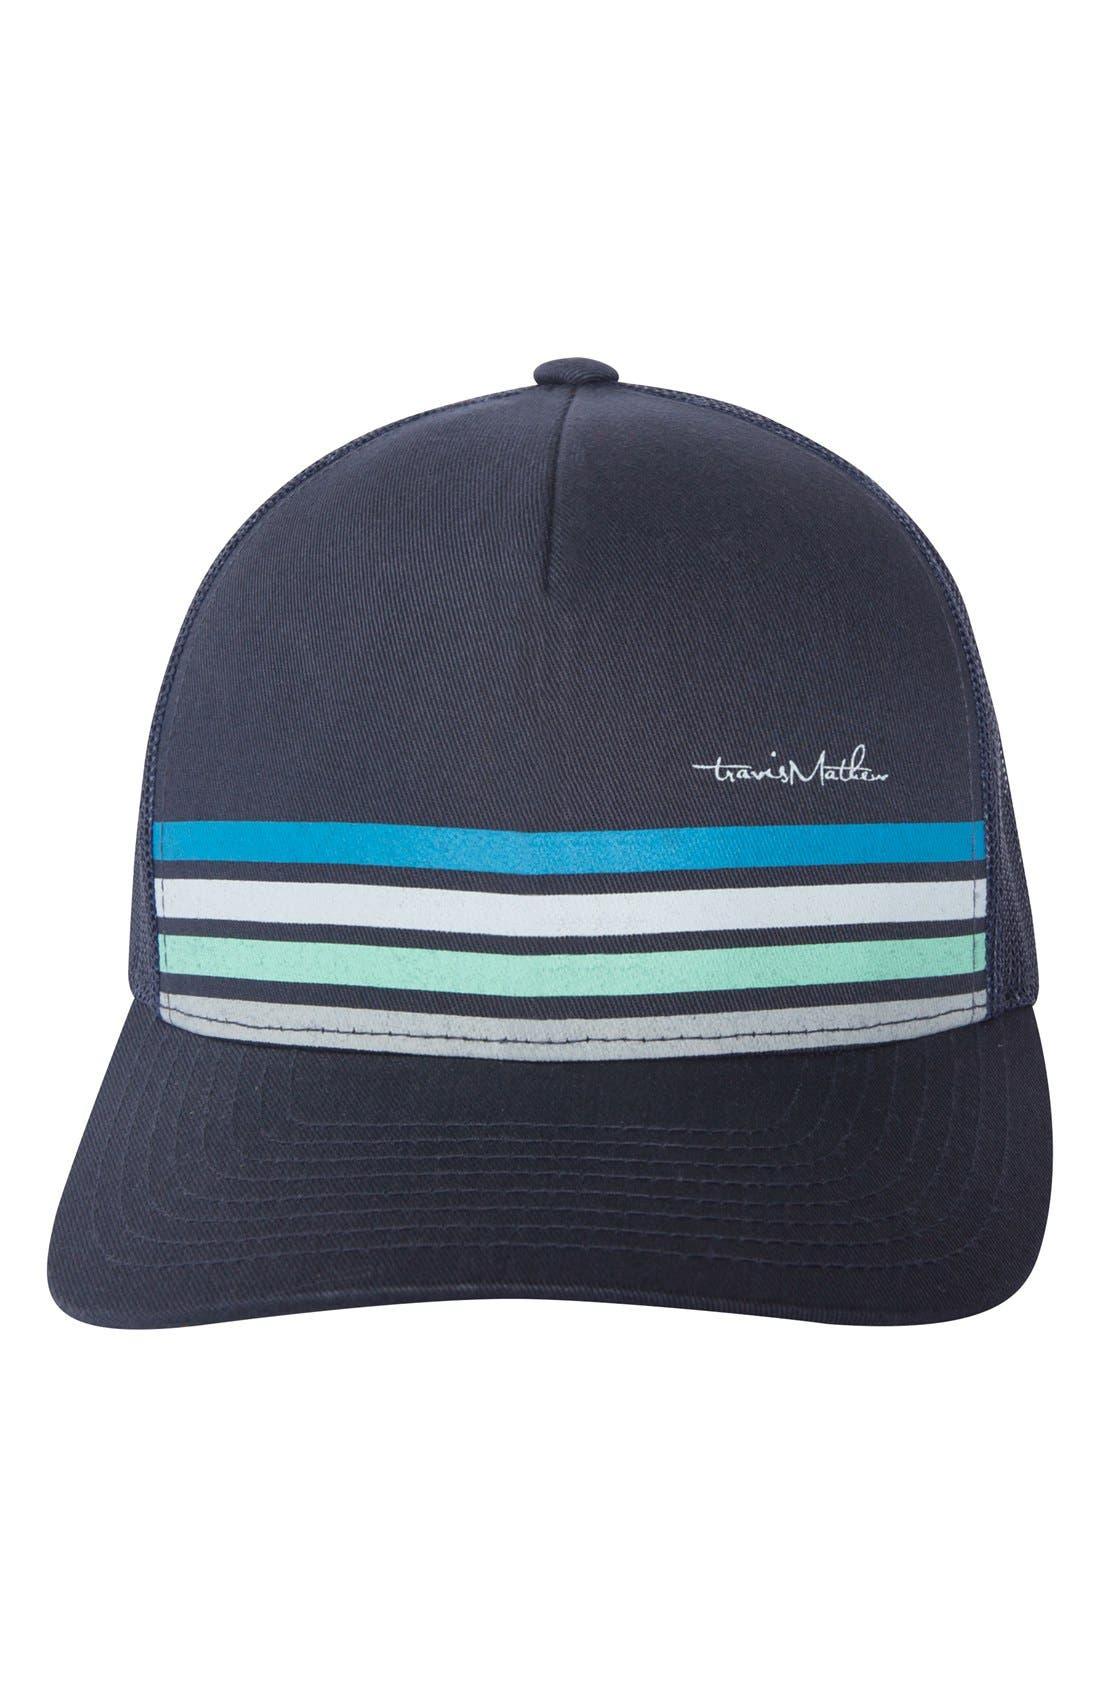 TRAVIS MATHEW Hoover Hat